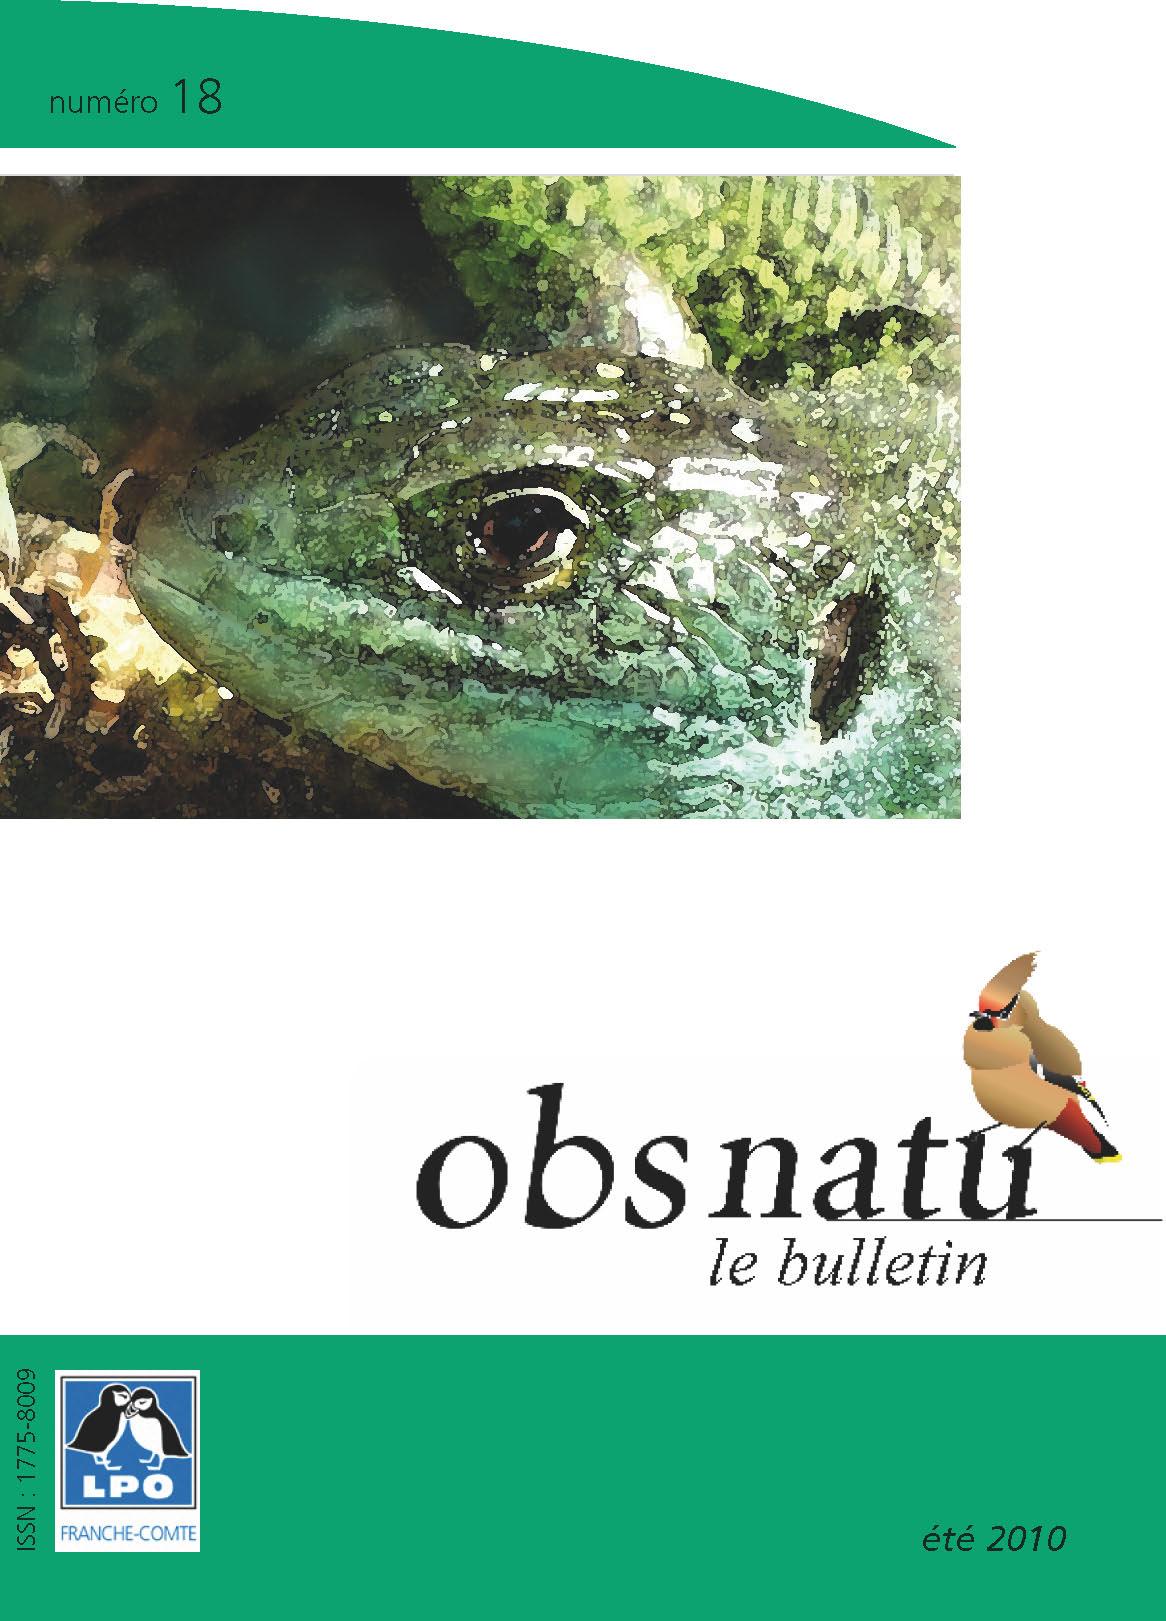 https://cdnfiles2.biolovision.net/franche-comte.lpo.fr/userfiles/publications/Obsnatubulls/Obsnatu18-Ete2010bdPage01.jpg